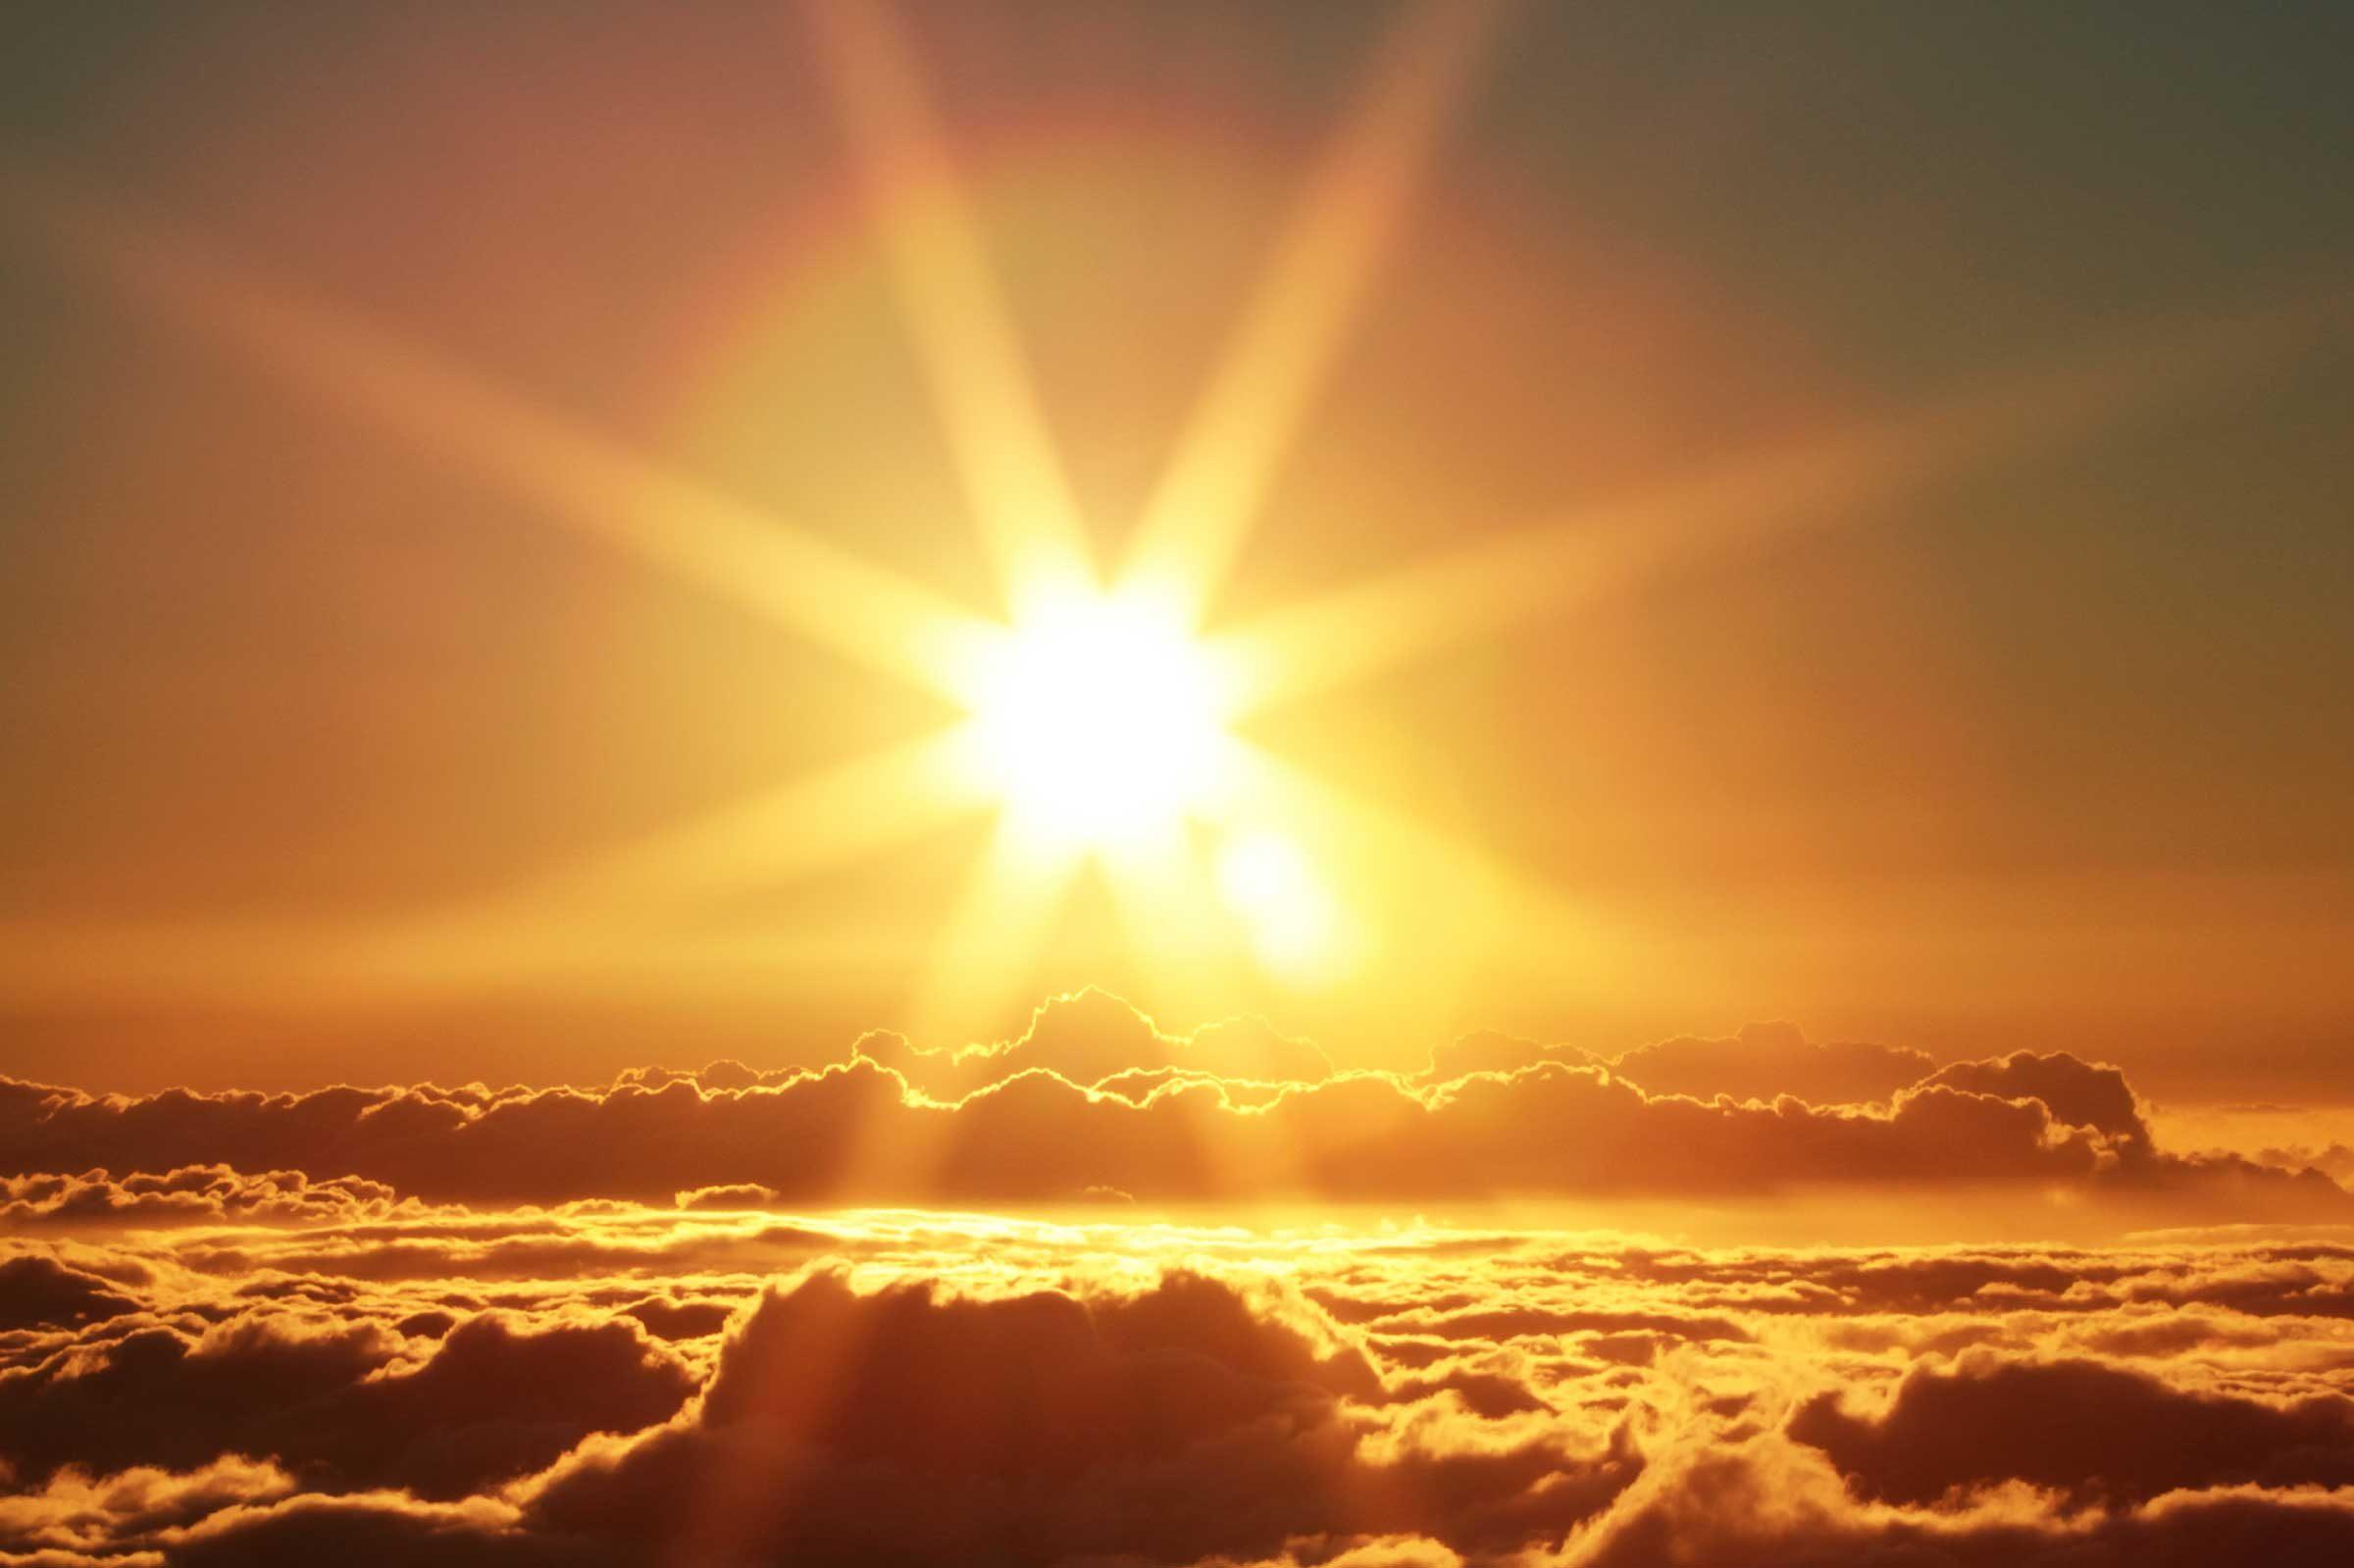 sunlight saving